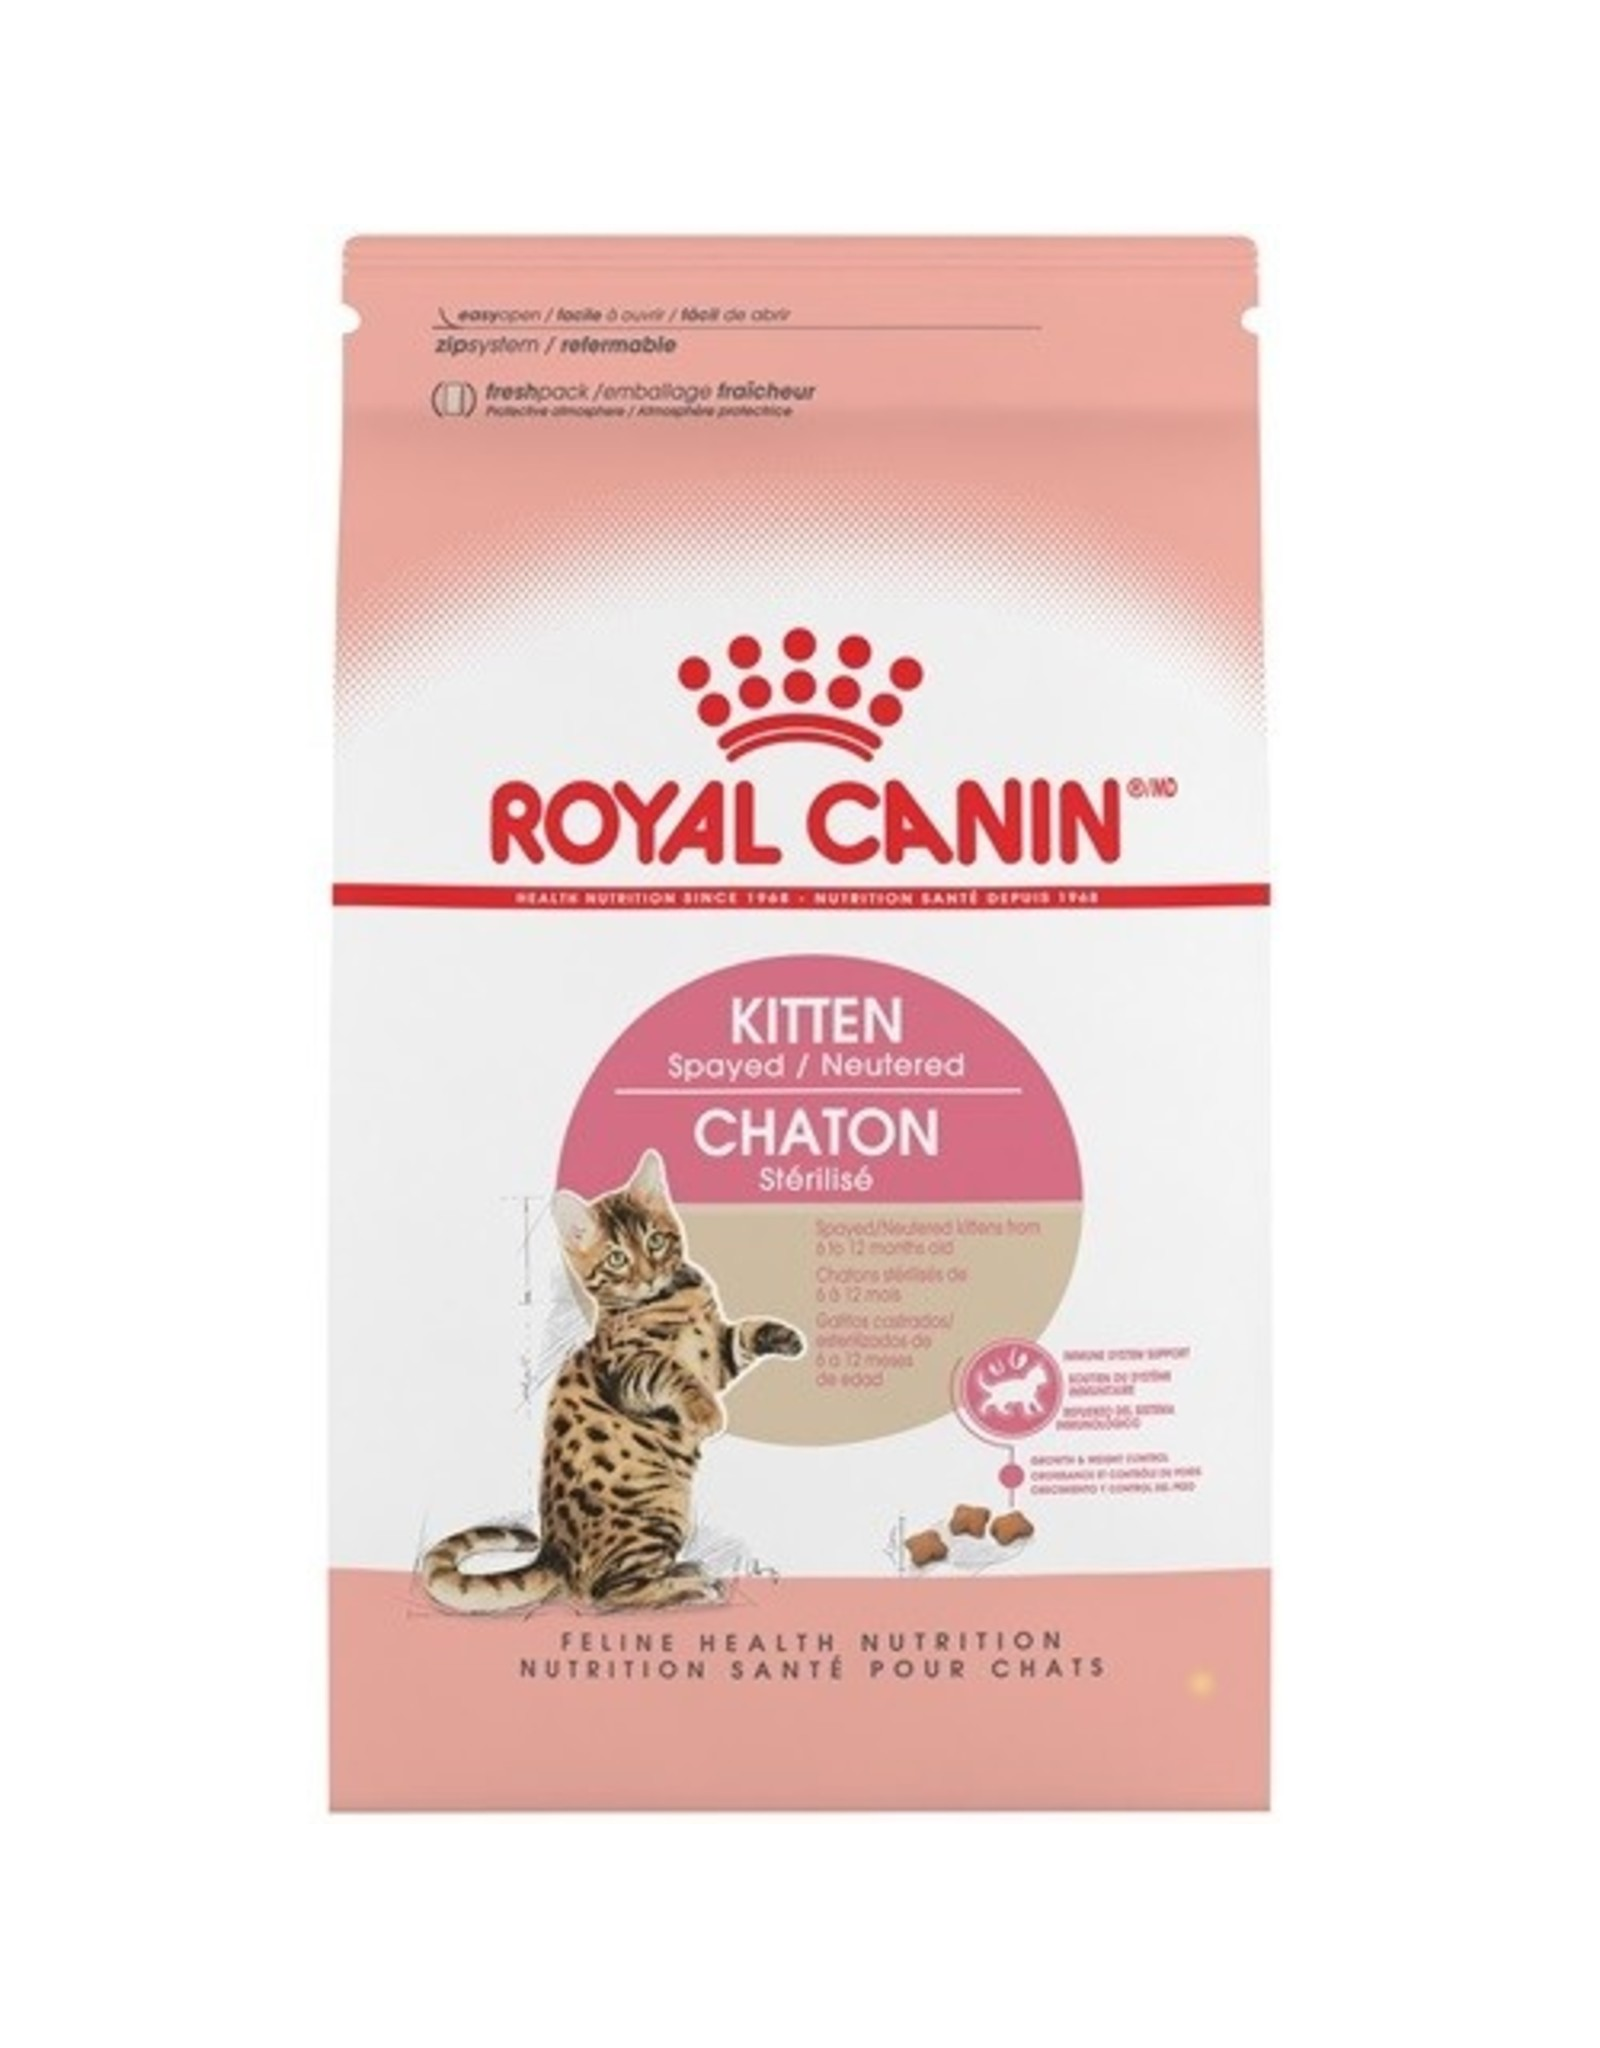 Royal Canin Royal Canin Kitten Spayed Neutered 2.5 lb